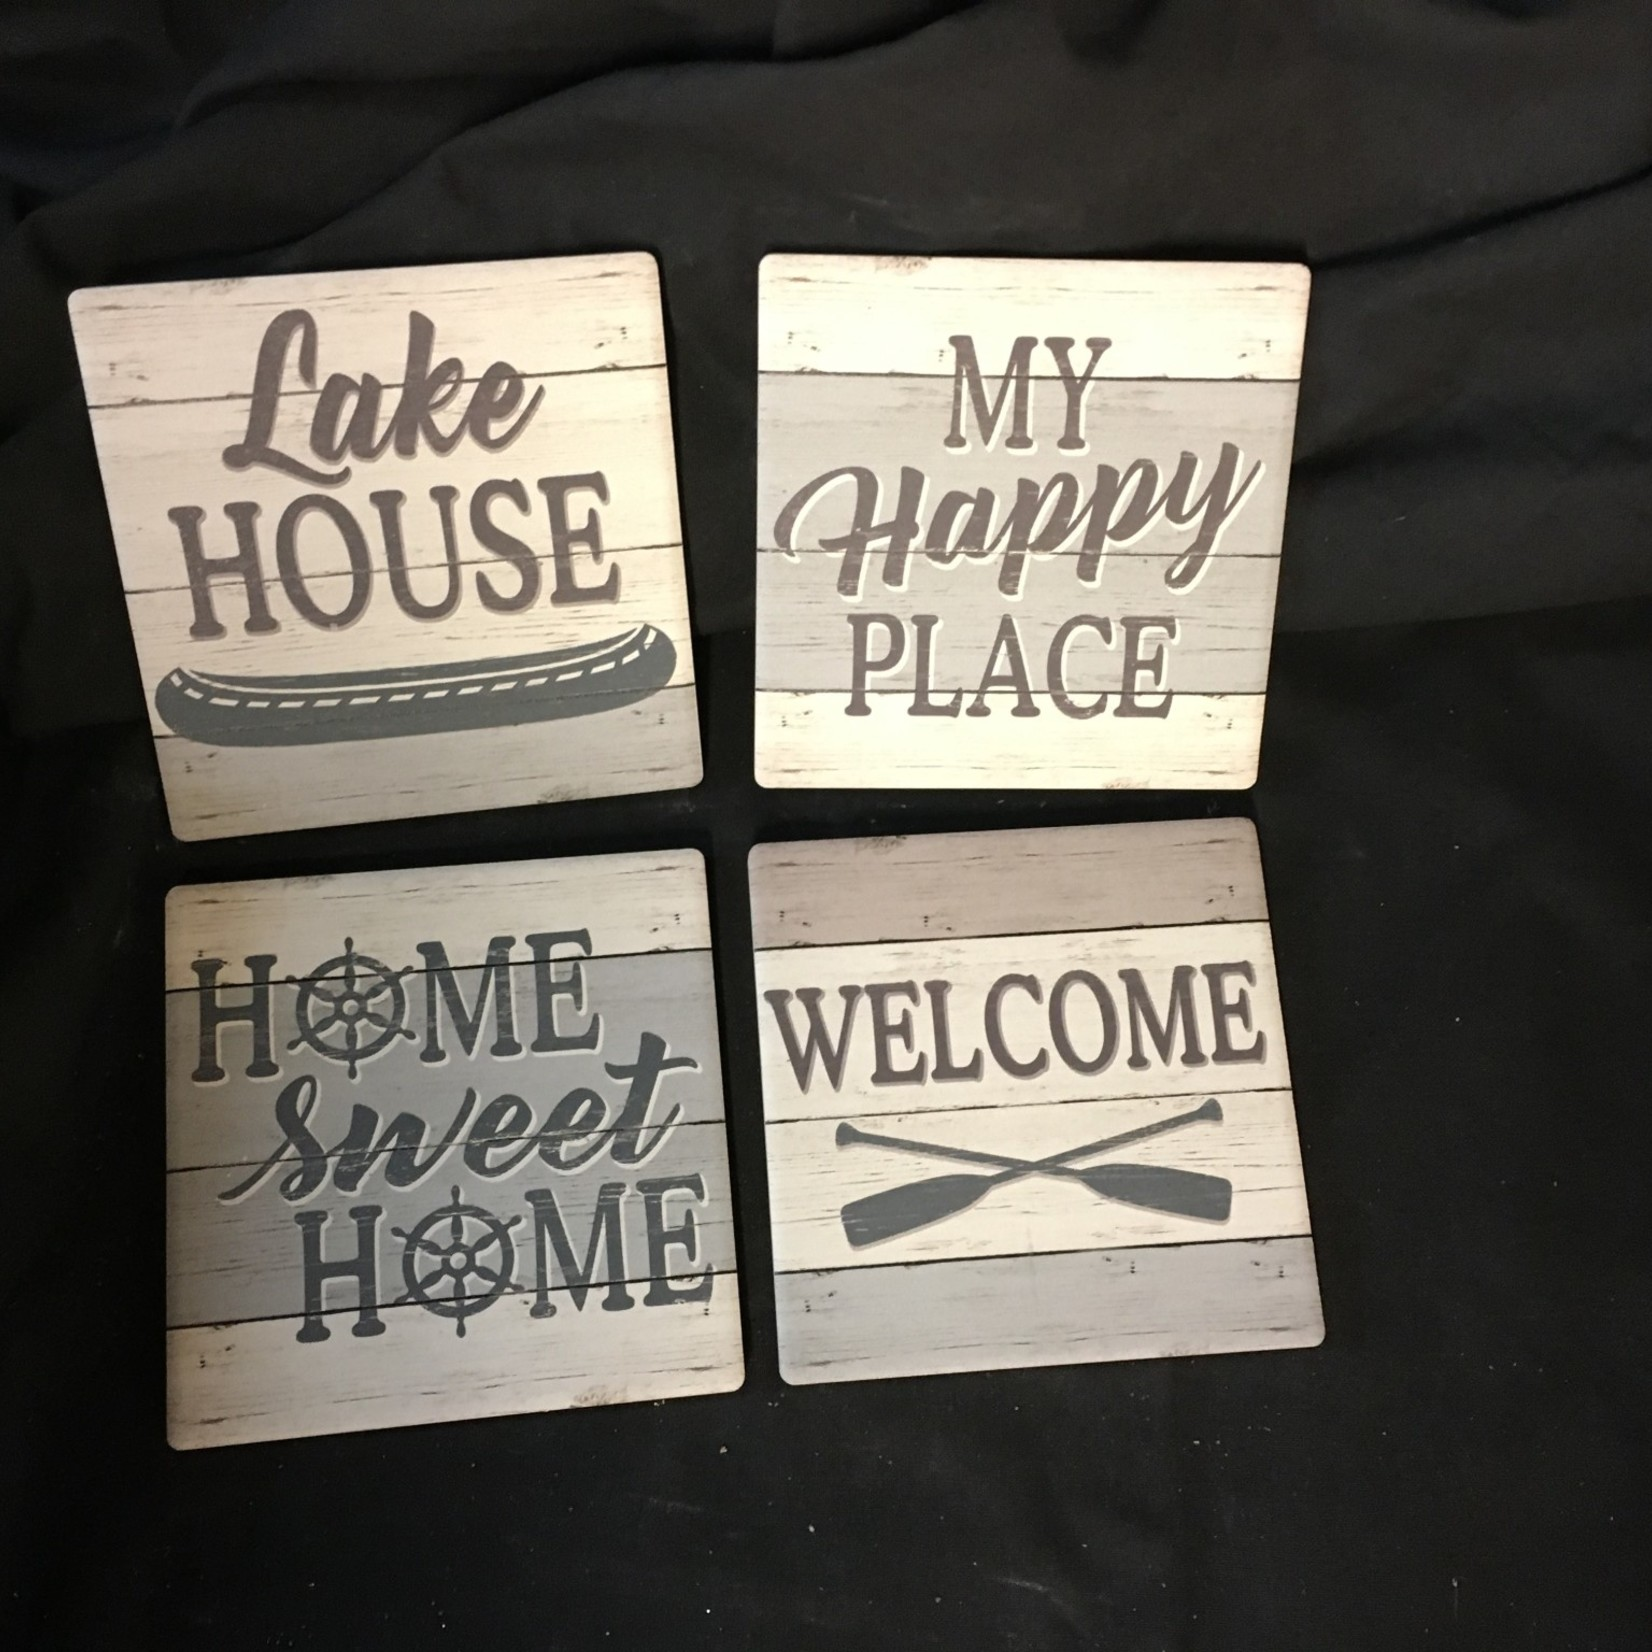 Lake House Stoneware  Coasters (4 pk)